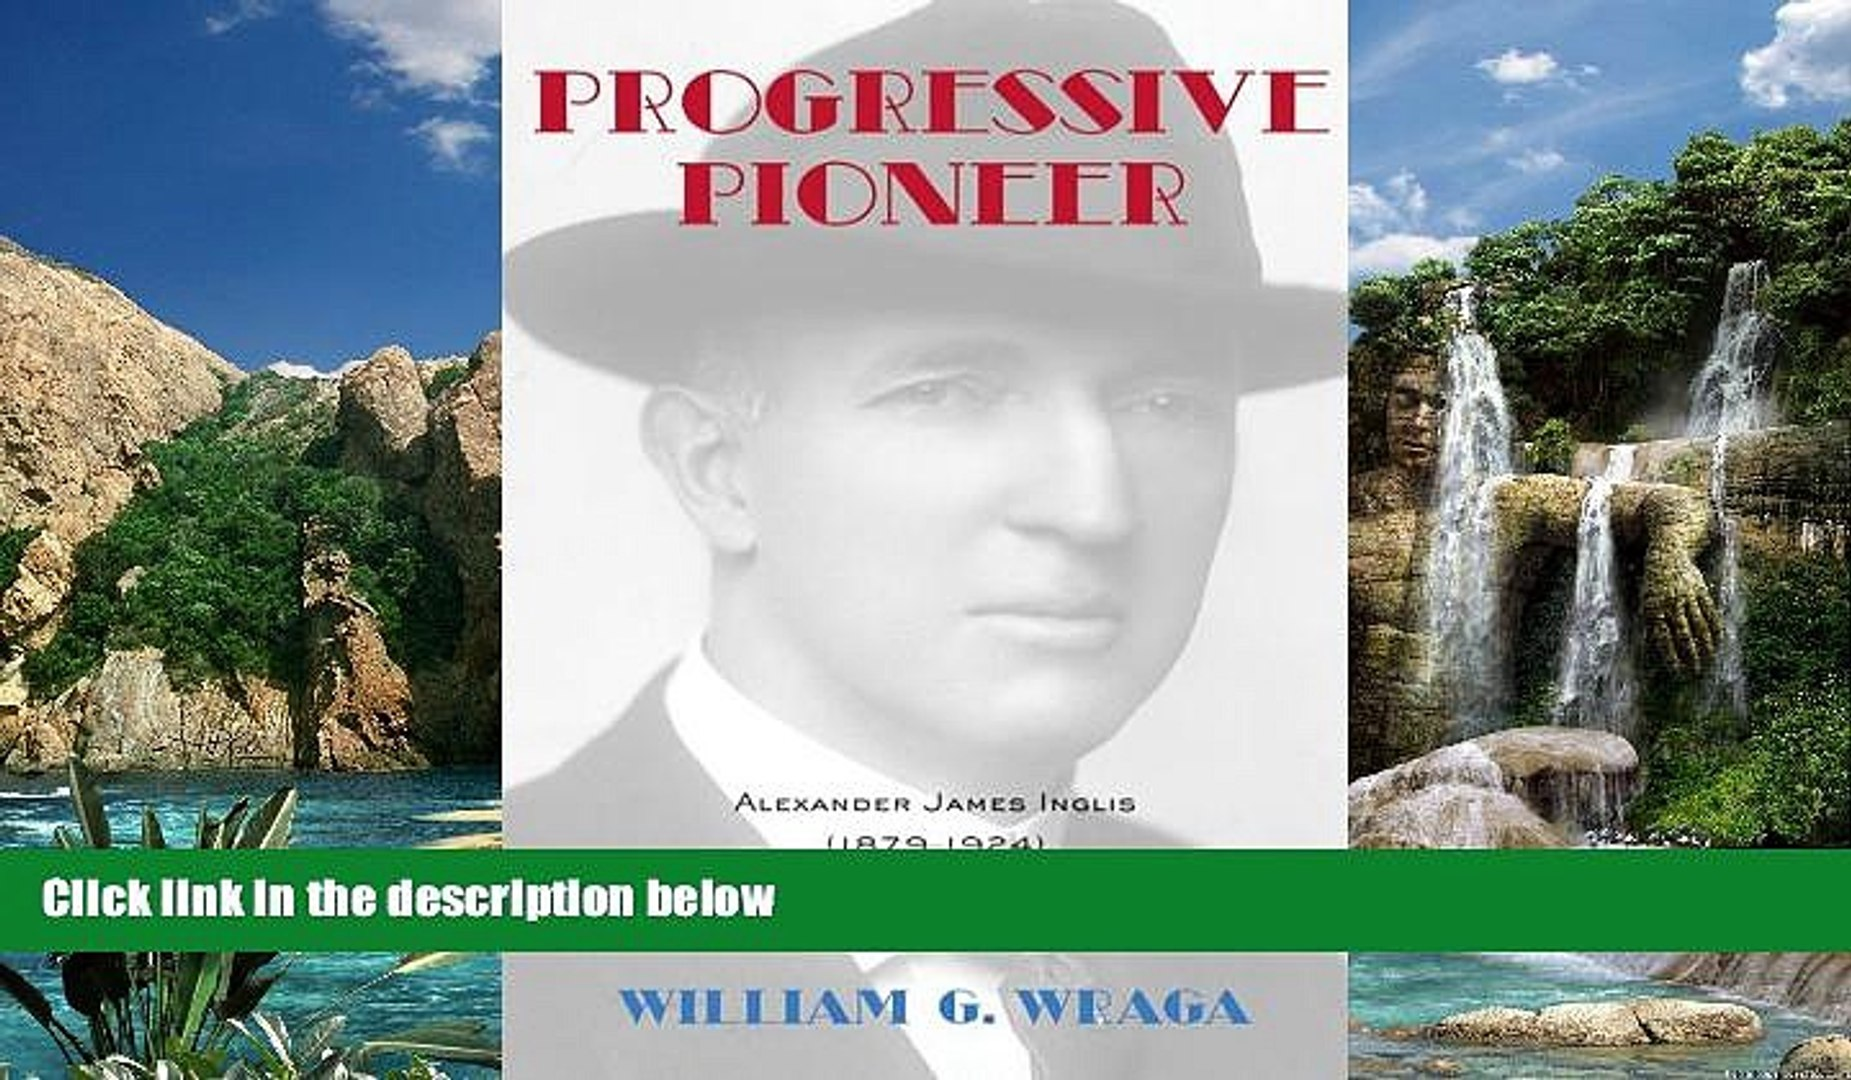 Buy William G. Wraga Progressive Pioneer: Alexander James Inglis (1879-1924) and American